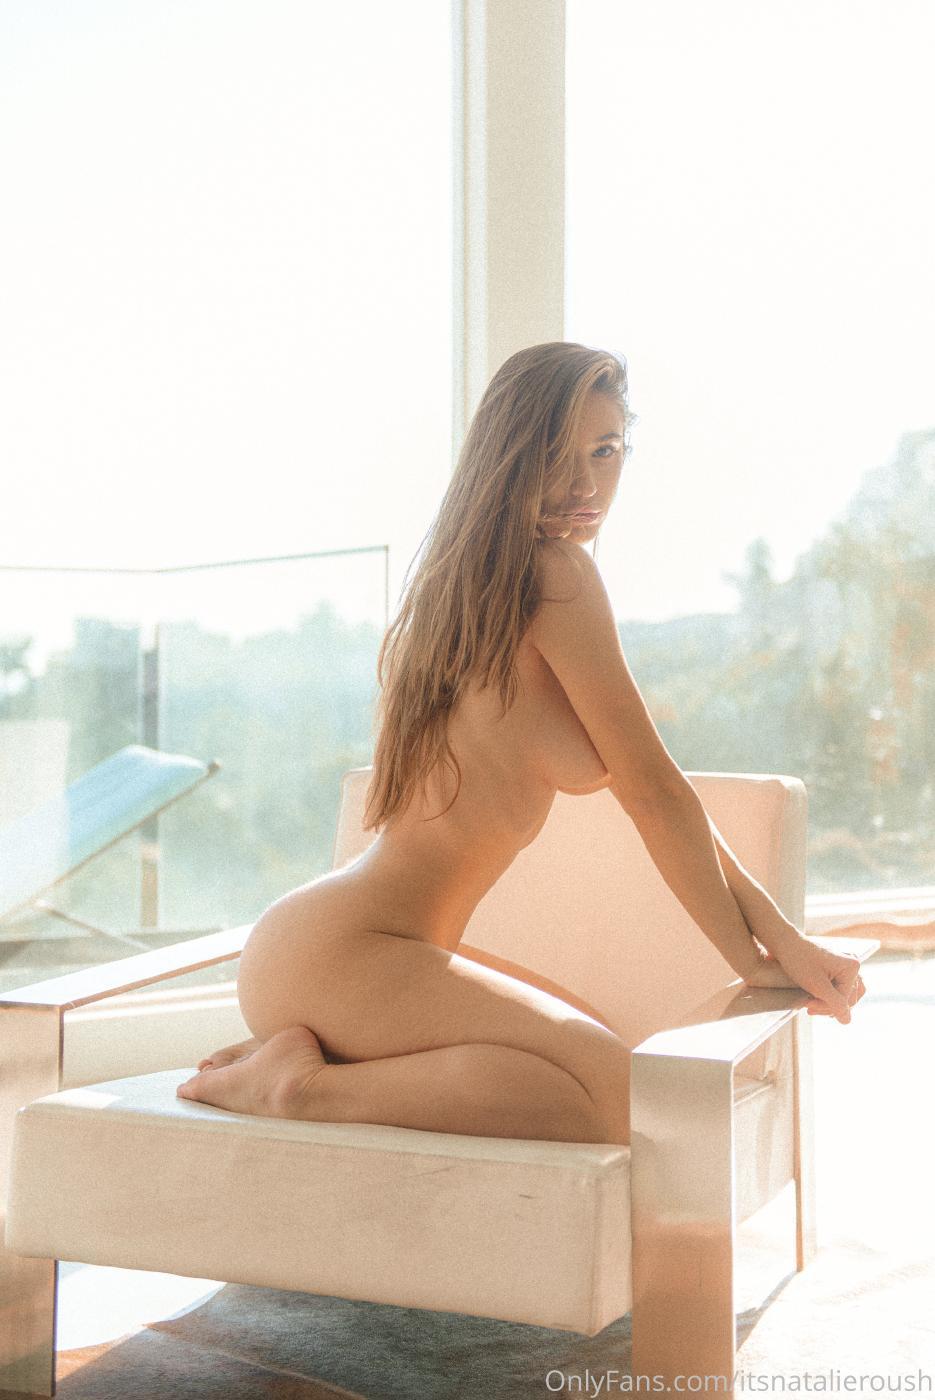 Natalie Roush Nude Bath Onlyfans Set Leaked 0005